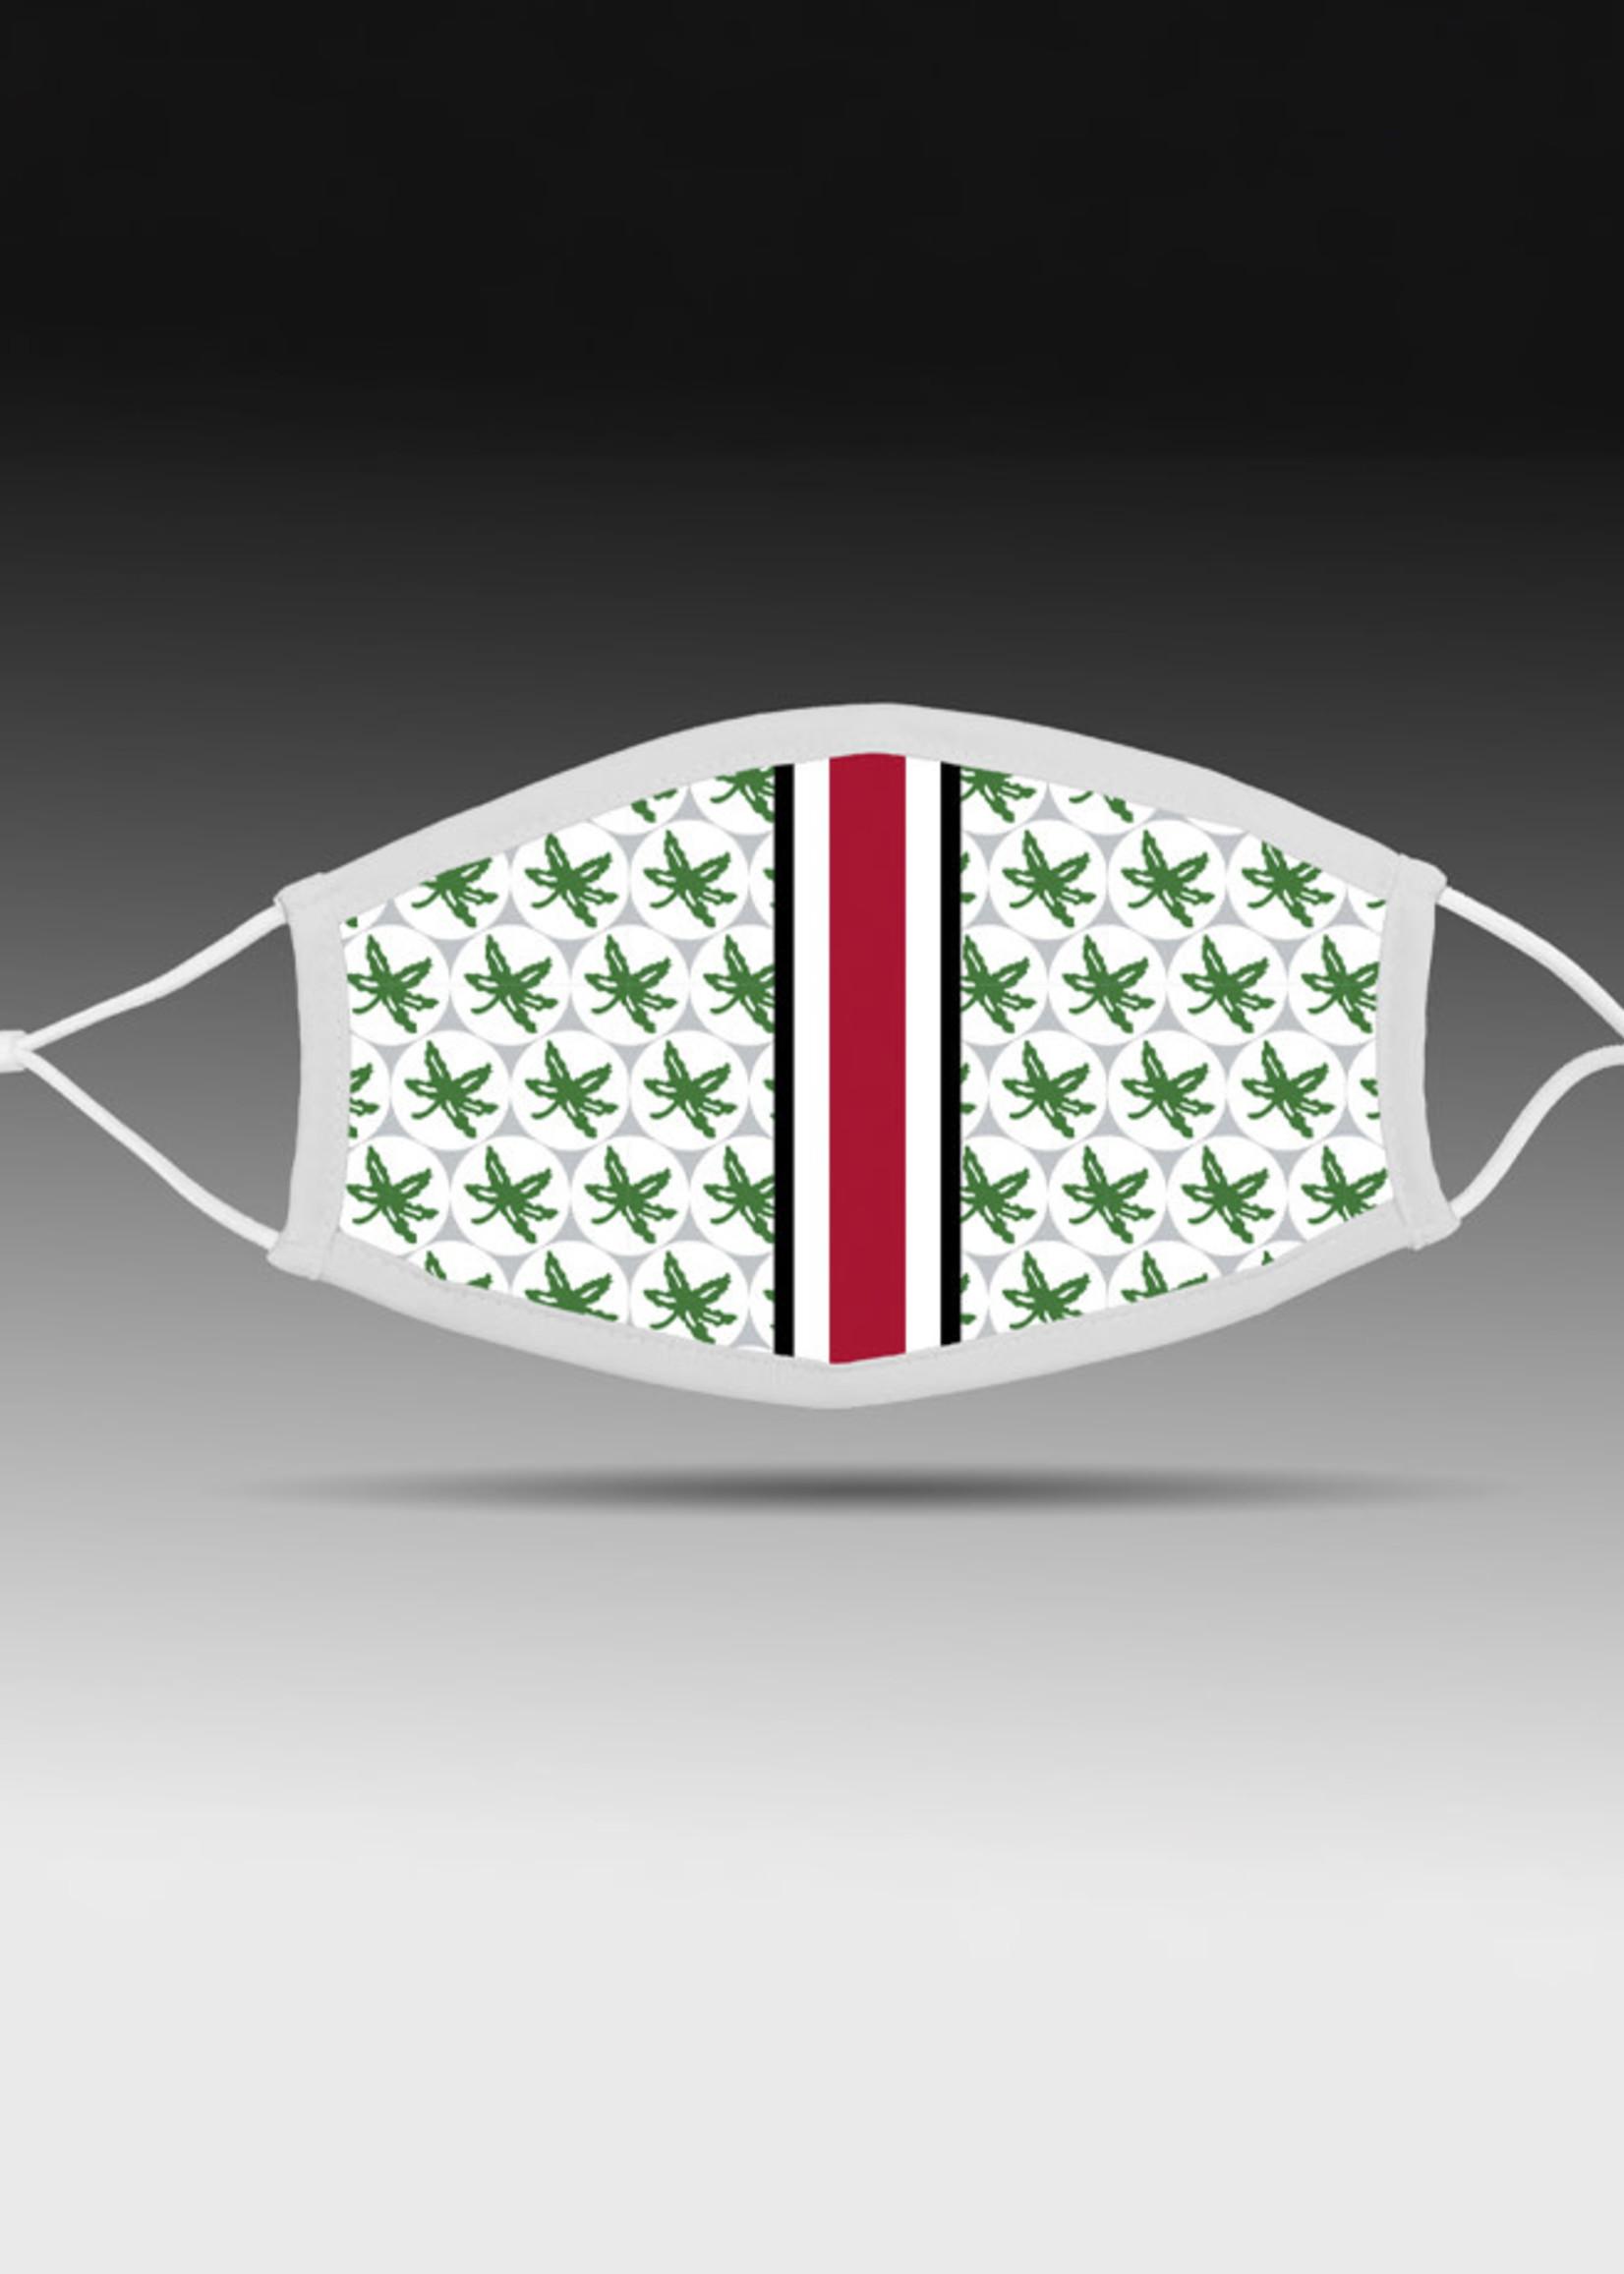 Bend Ohio State Buckeyes Helmet Adjustable Fit Face Covering